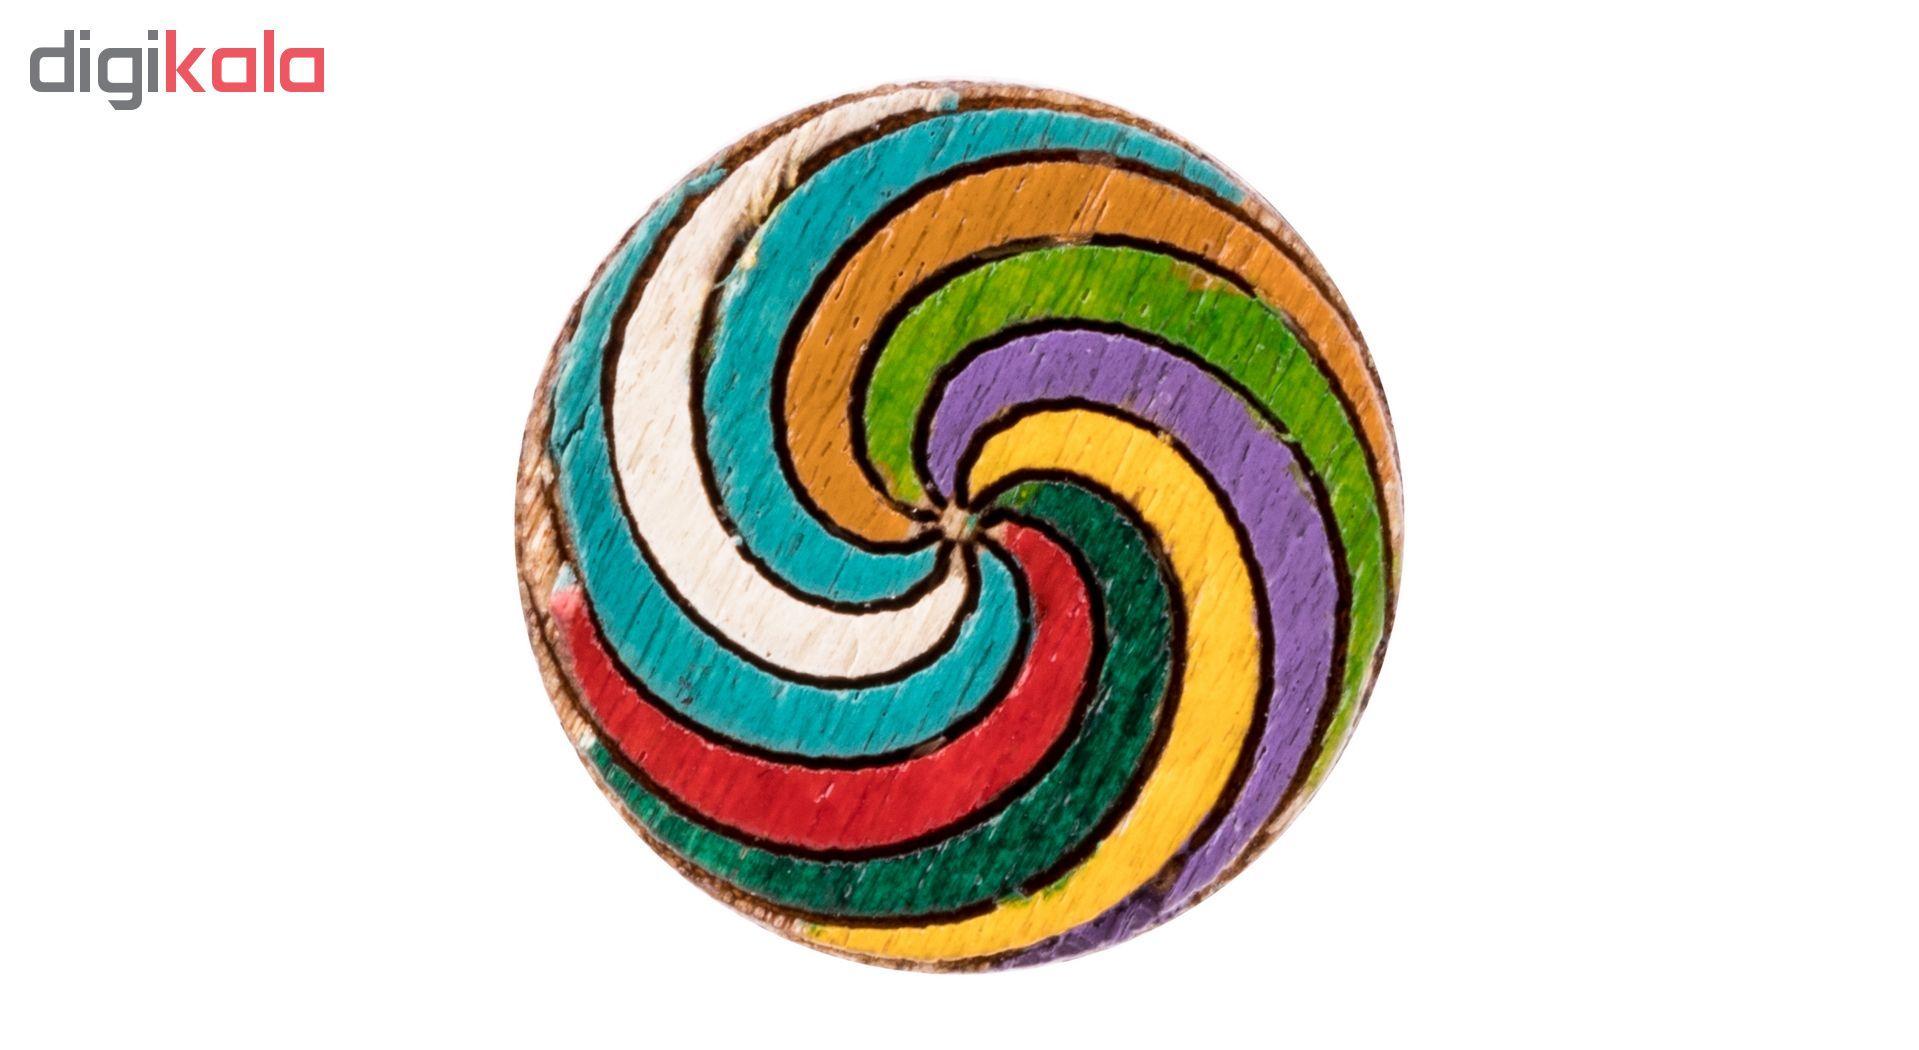 گوشواره چوبی میخی طرح رنگارنگ 2 main 1 2